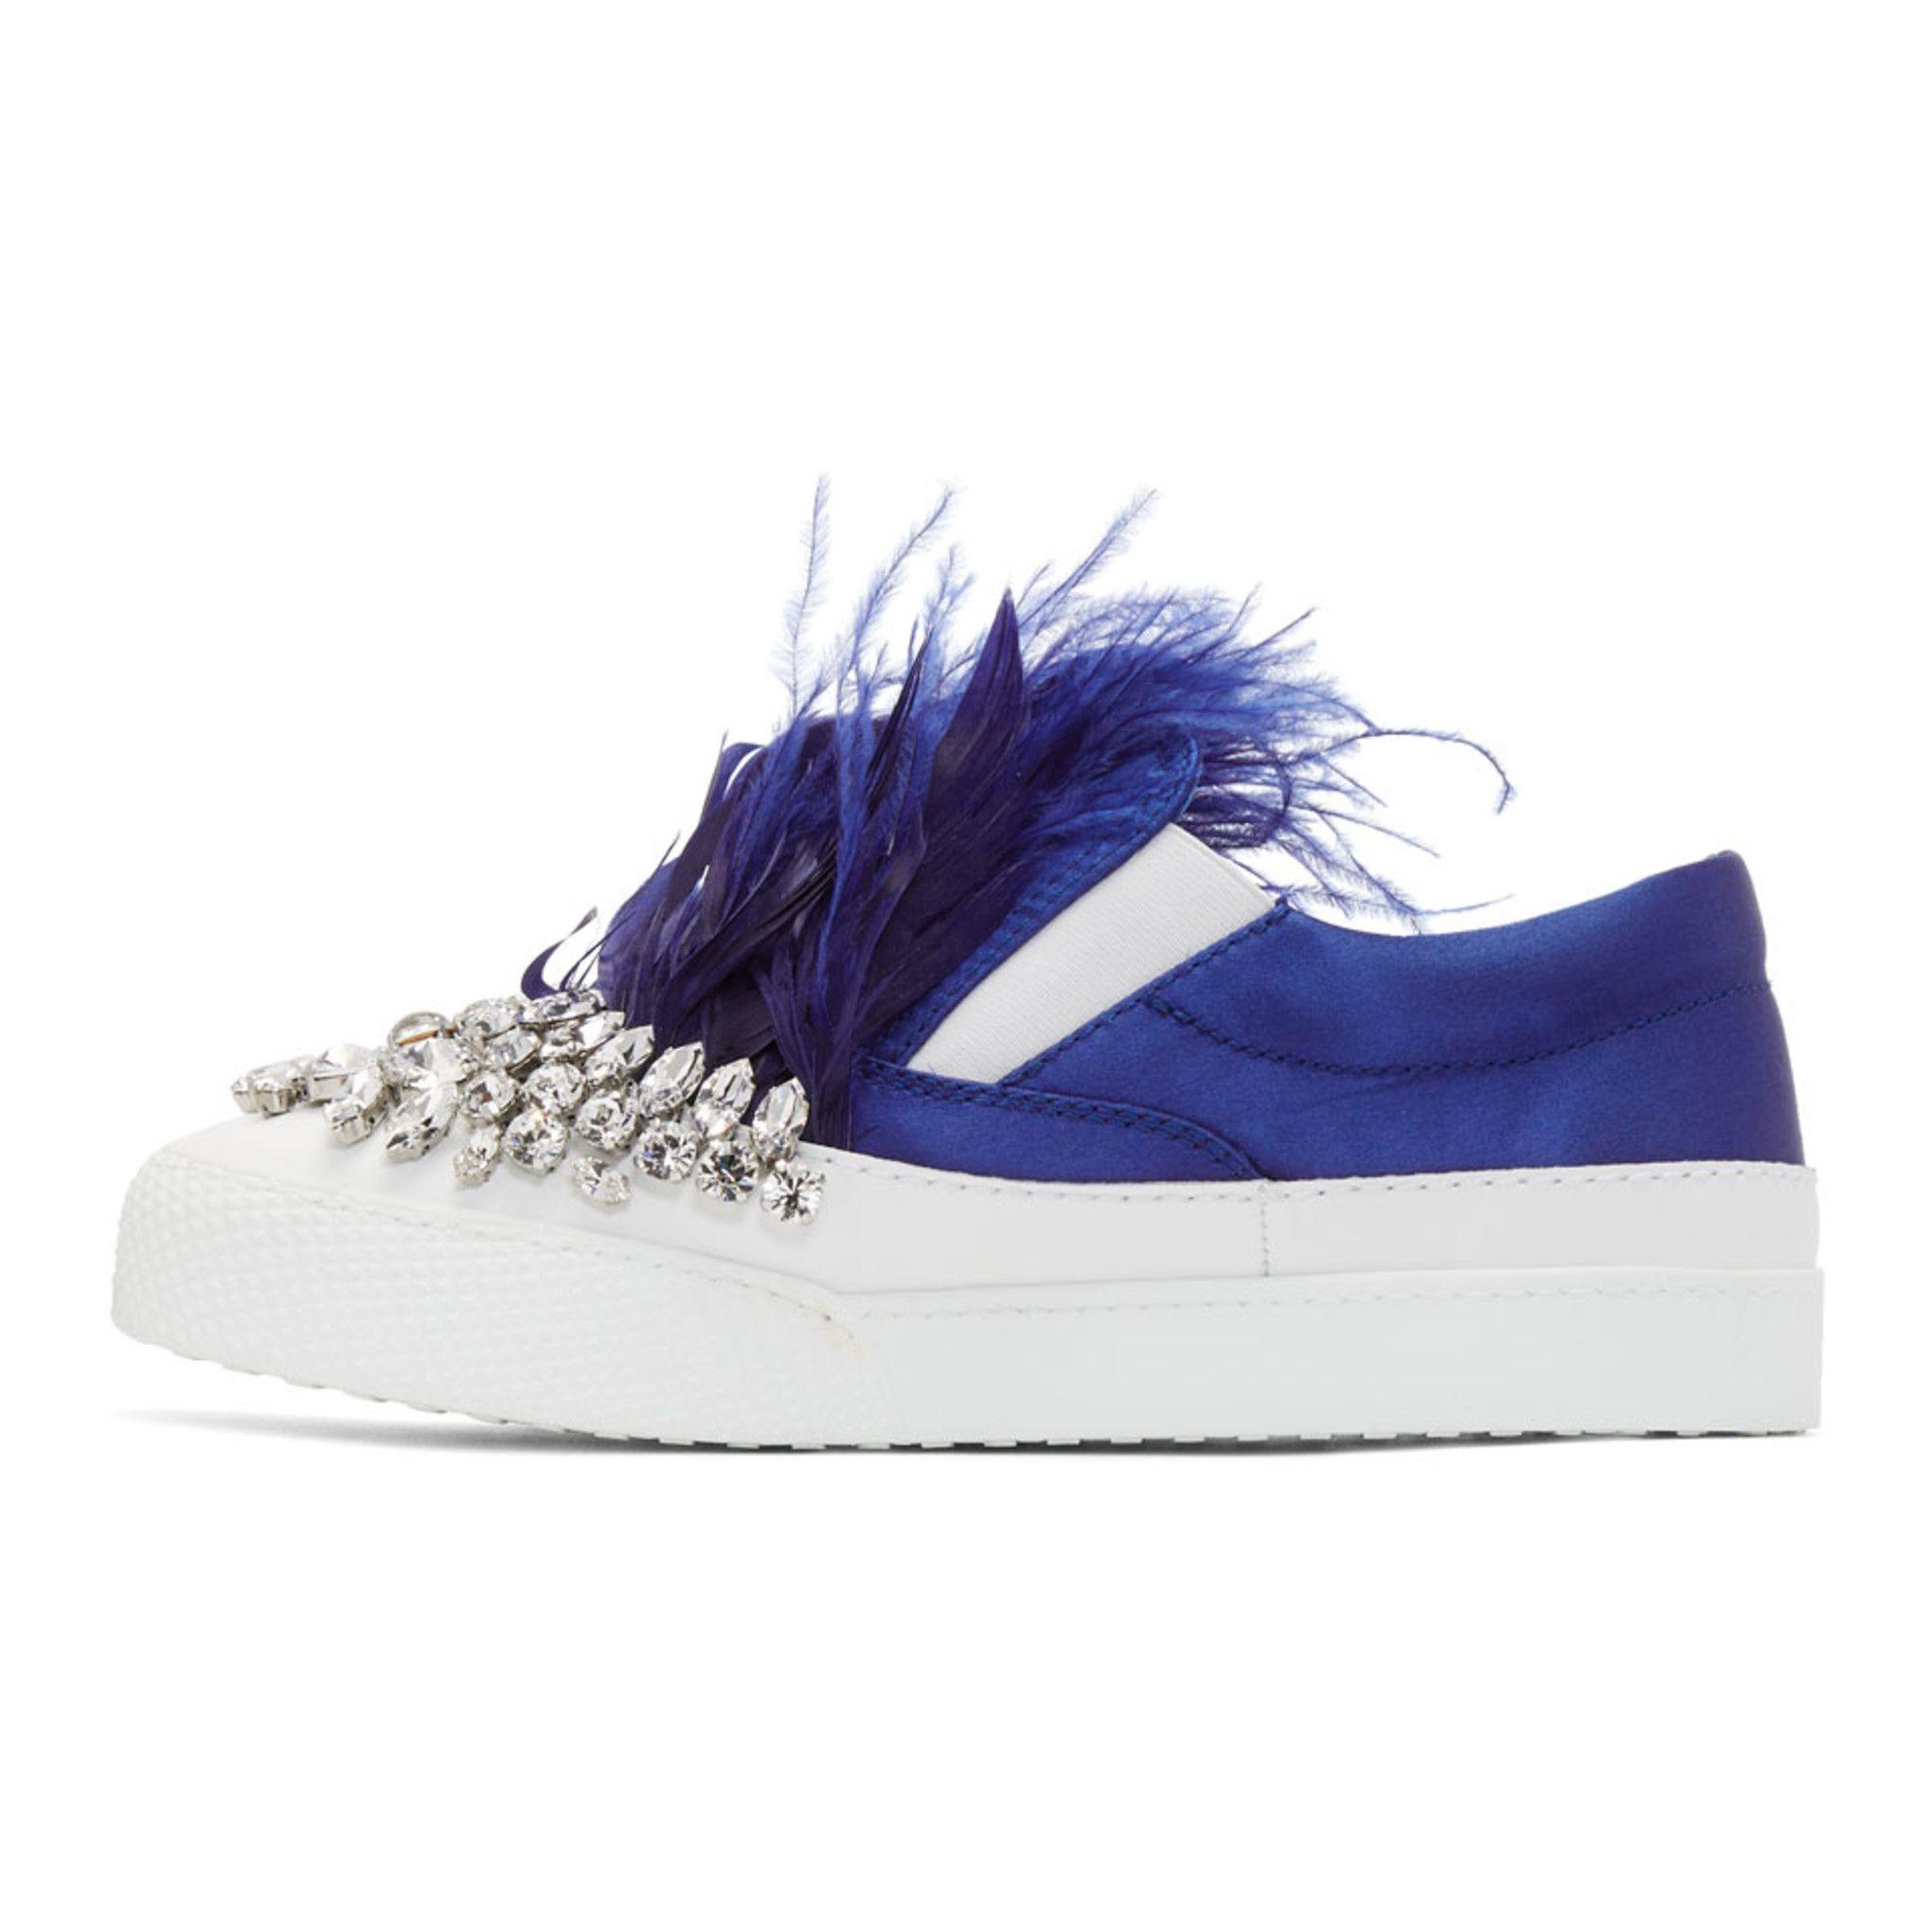 Miu Miu White & Blue Feather Crystal Slip-On Sneakers